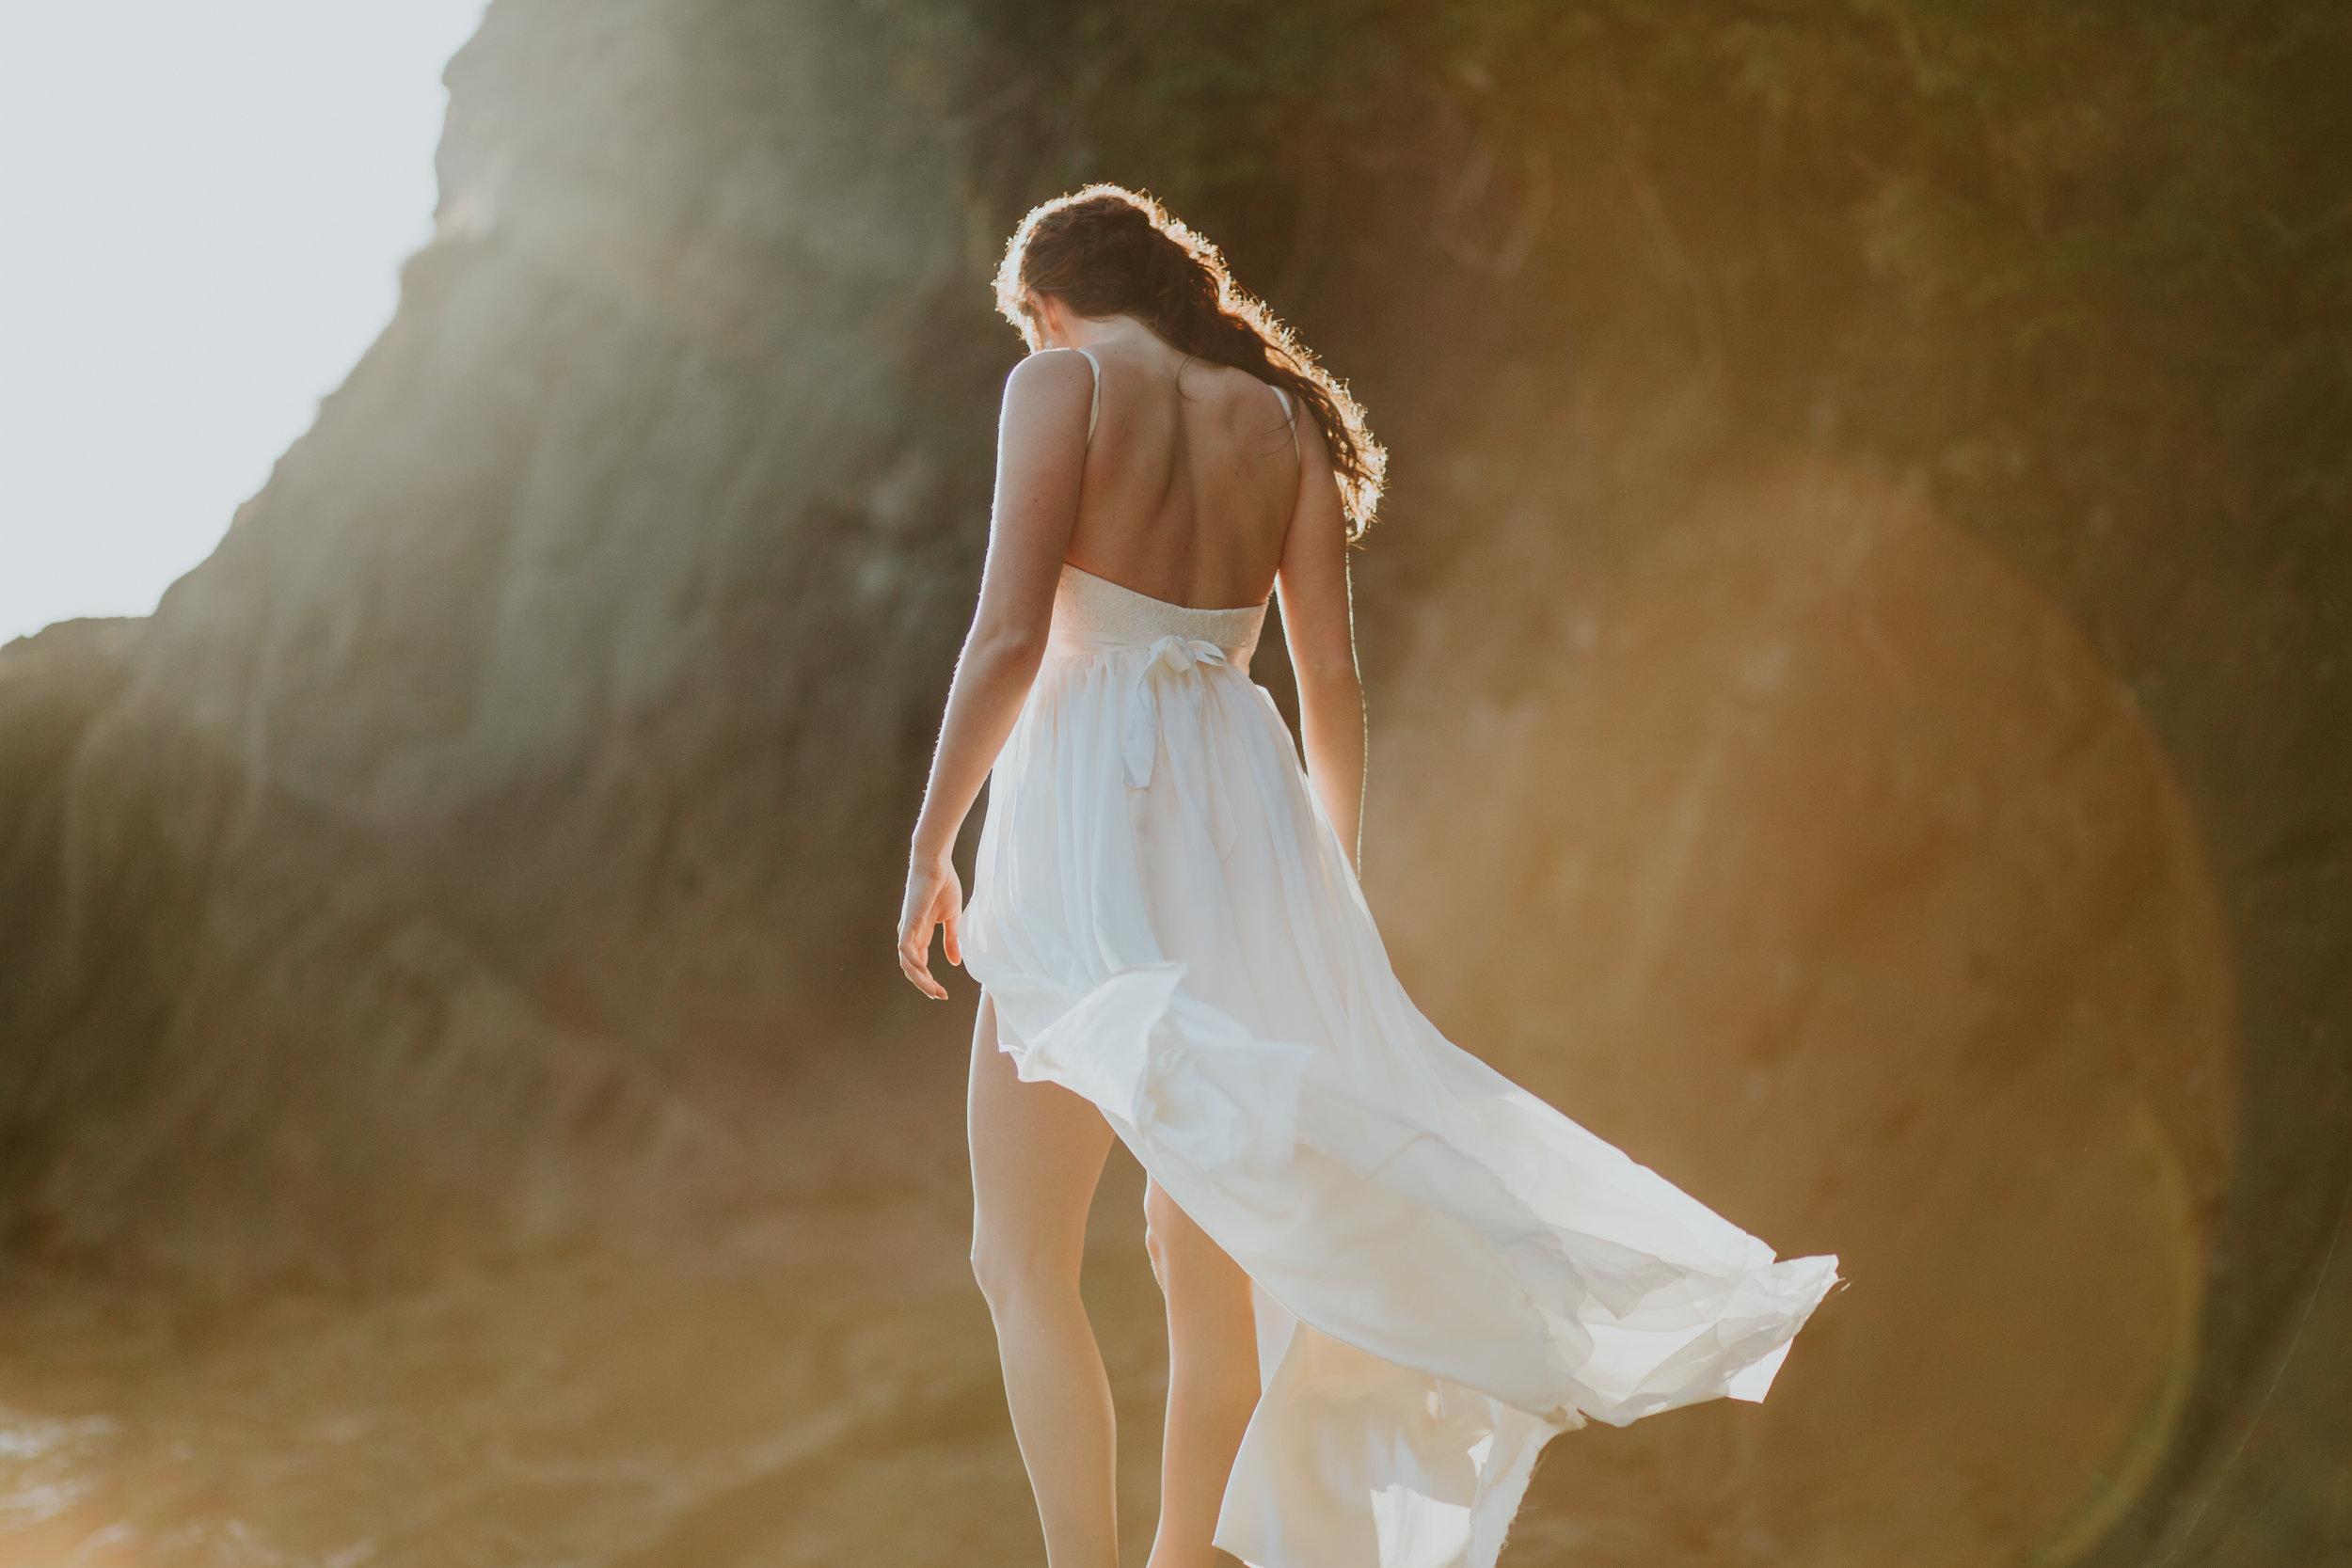 Port-Angeles-Salt-Creek-beach-wedding-bride-PNW-olympic-peninsula-photographer-Kayla-Dawn-Photography-outdoors-golden-hour-dancer-dress (33).jpg